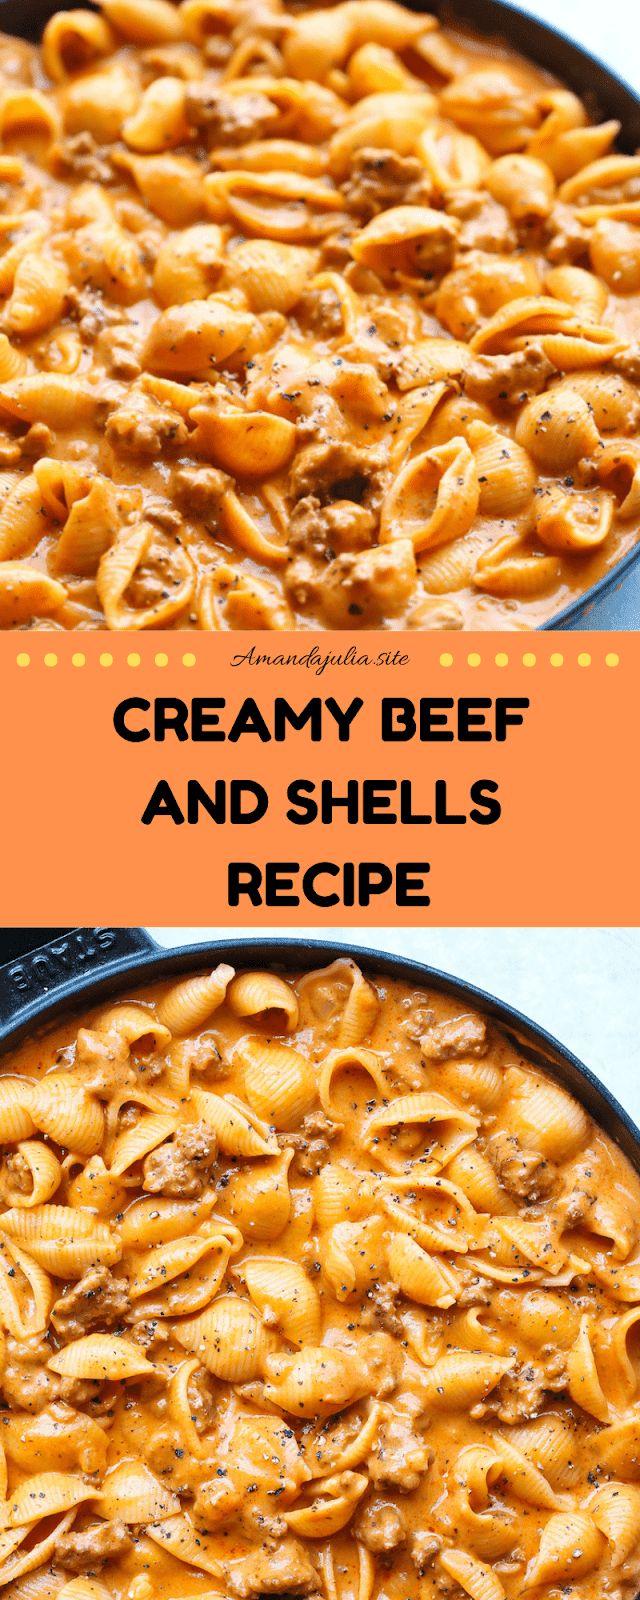 Creamy Beef and Shells Recipe